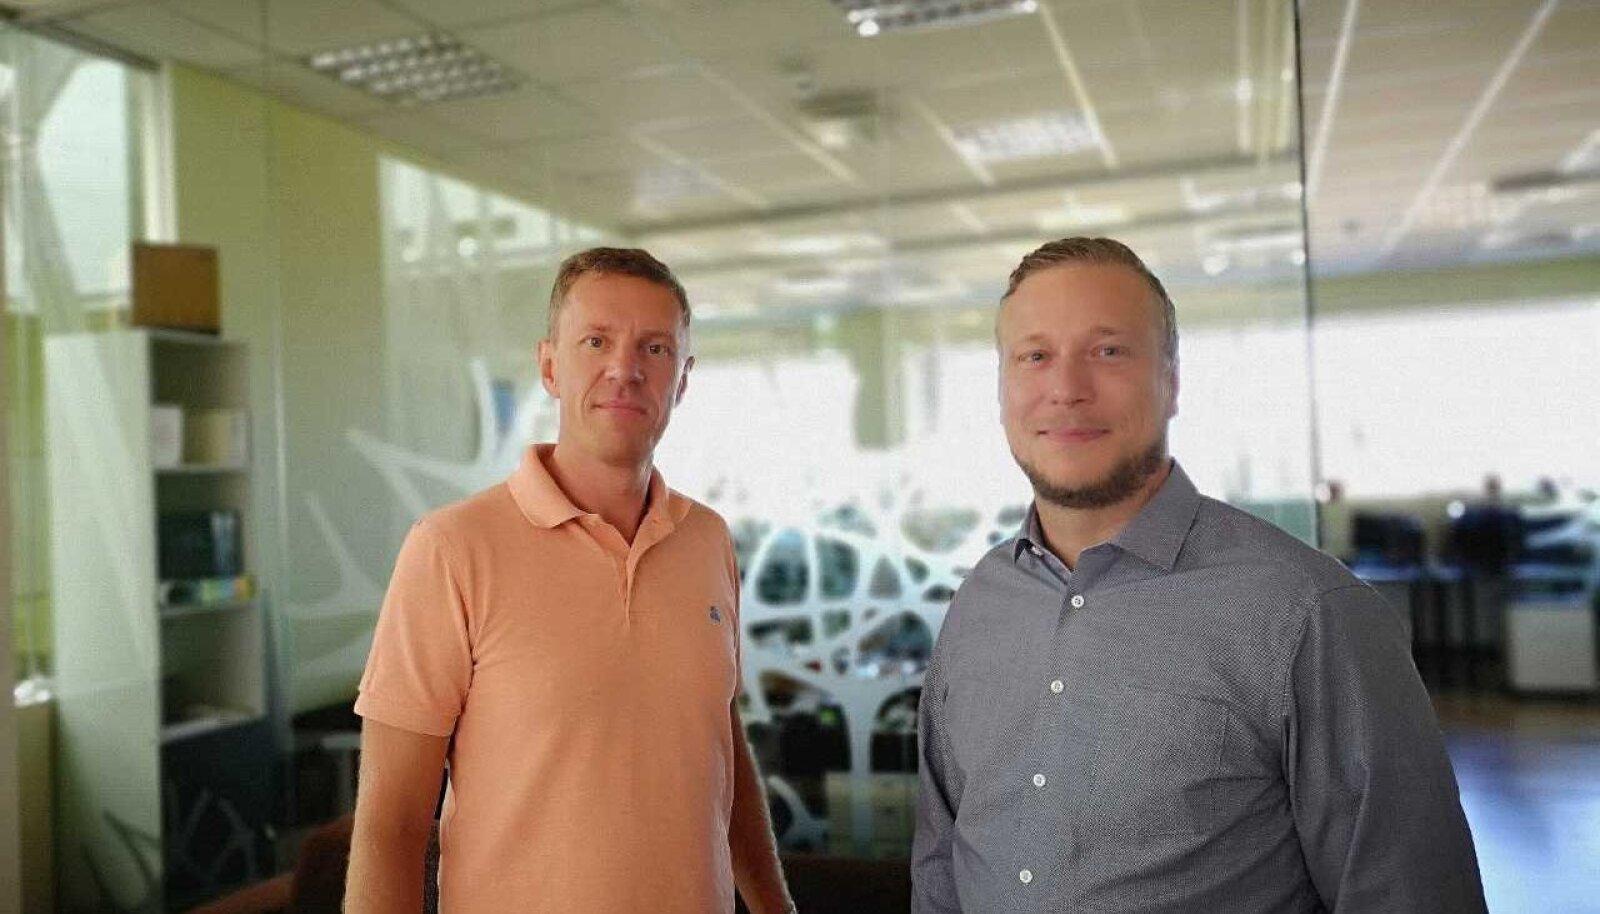 Uptime´i tegevjuht Eero Tohver ja West Soft Development A/S-i tegevjuht Ronni Madsen